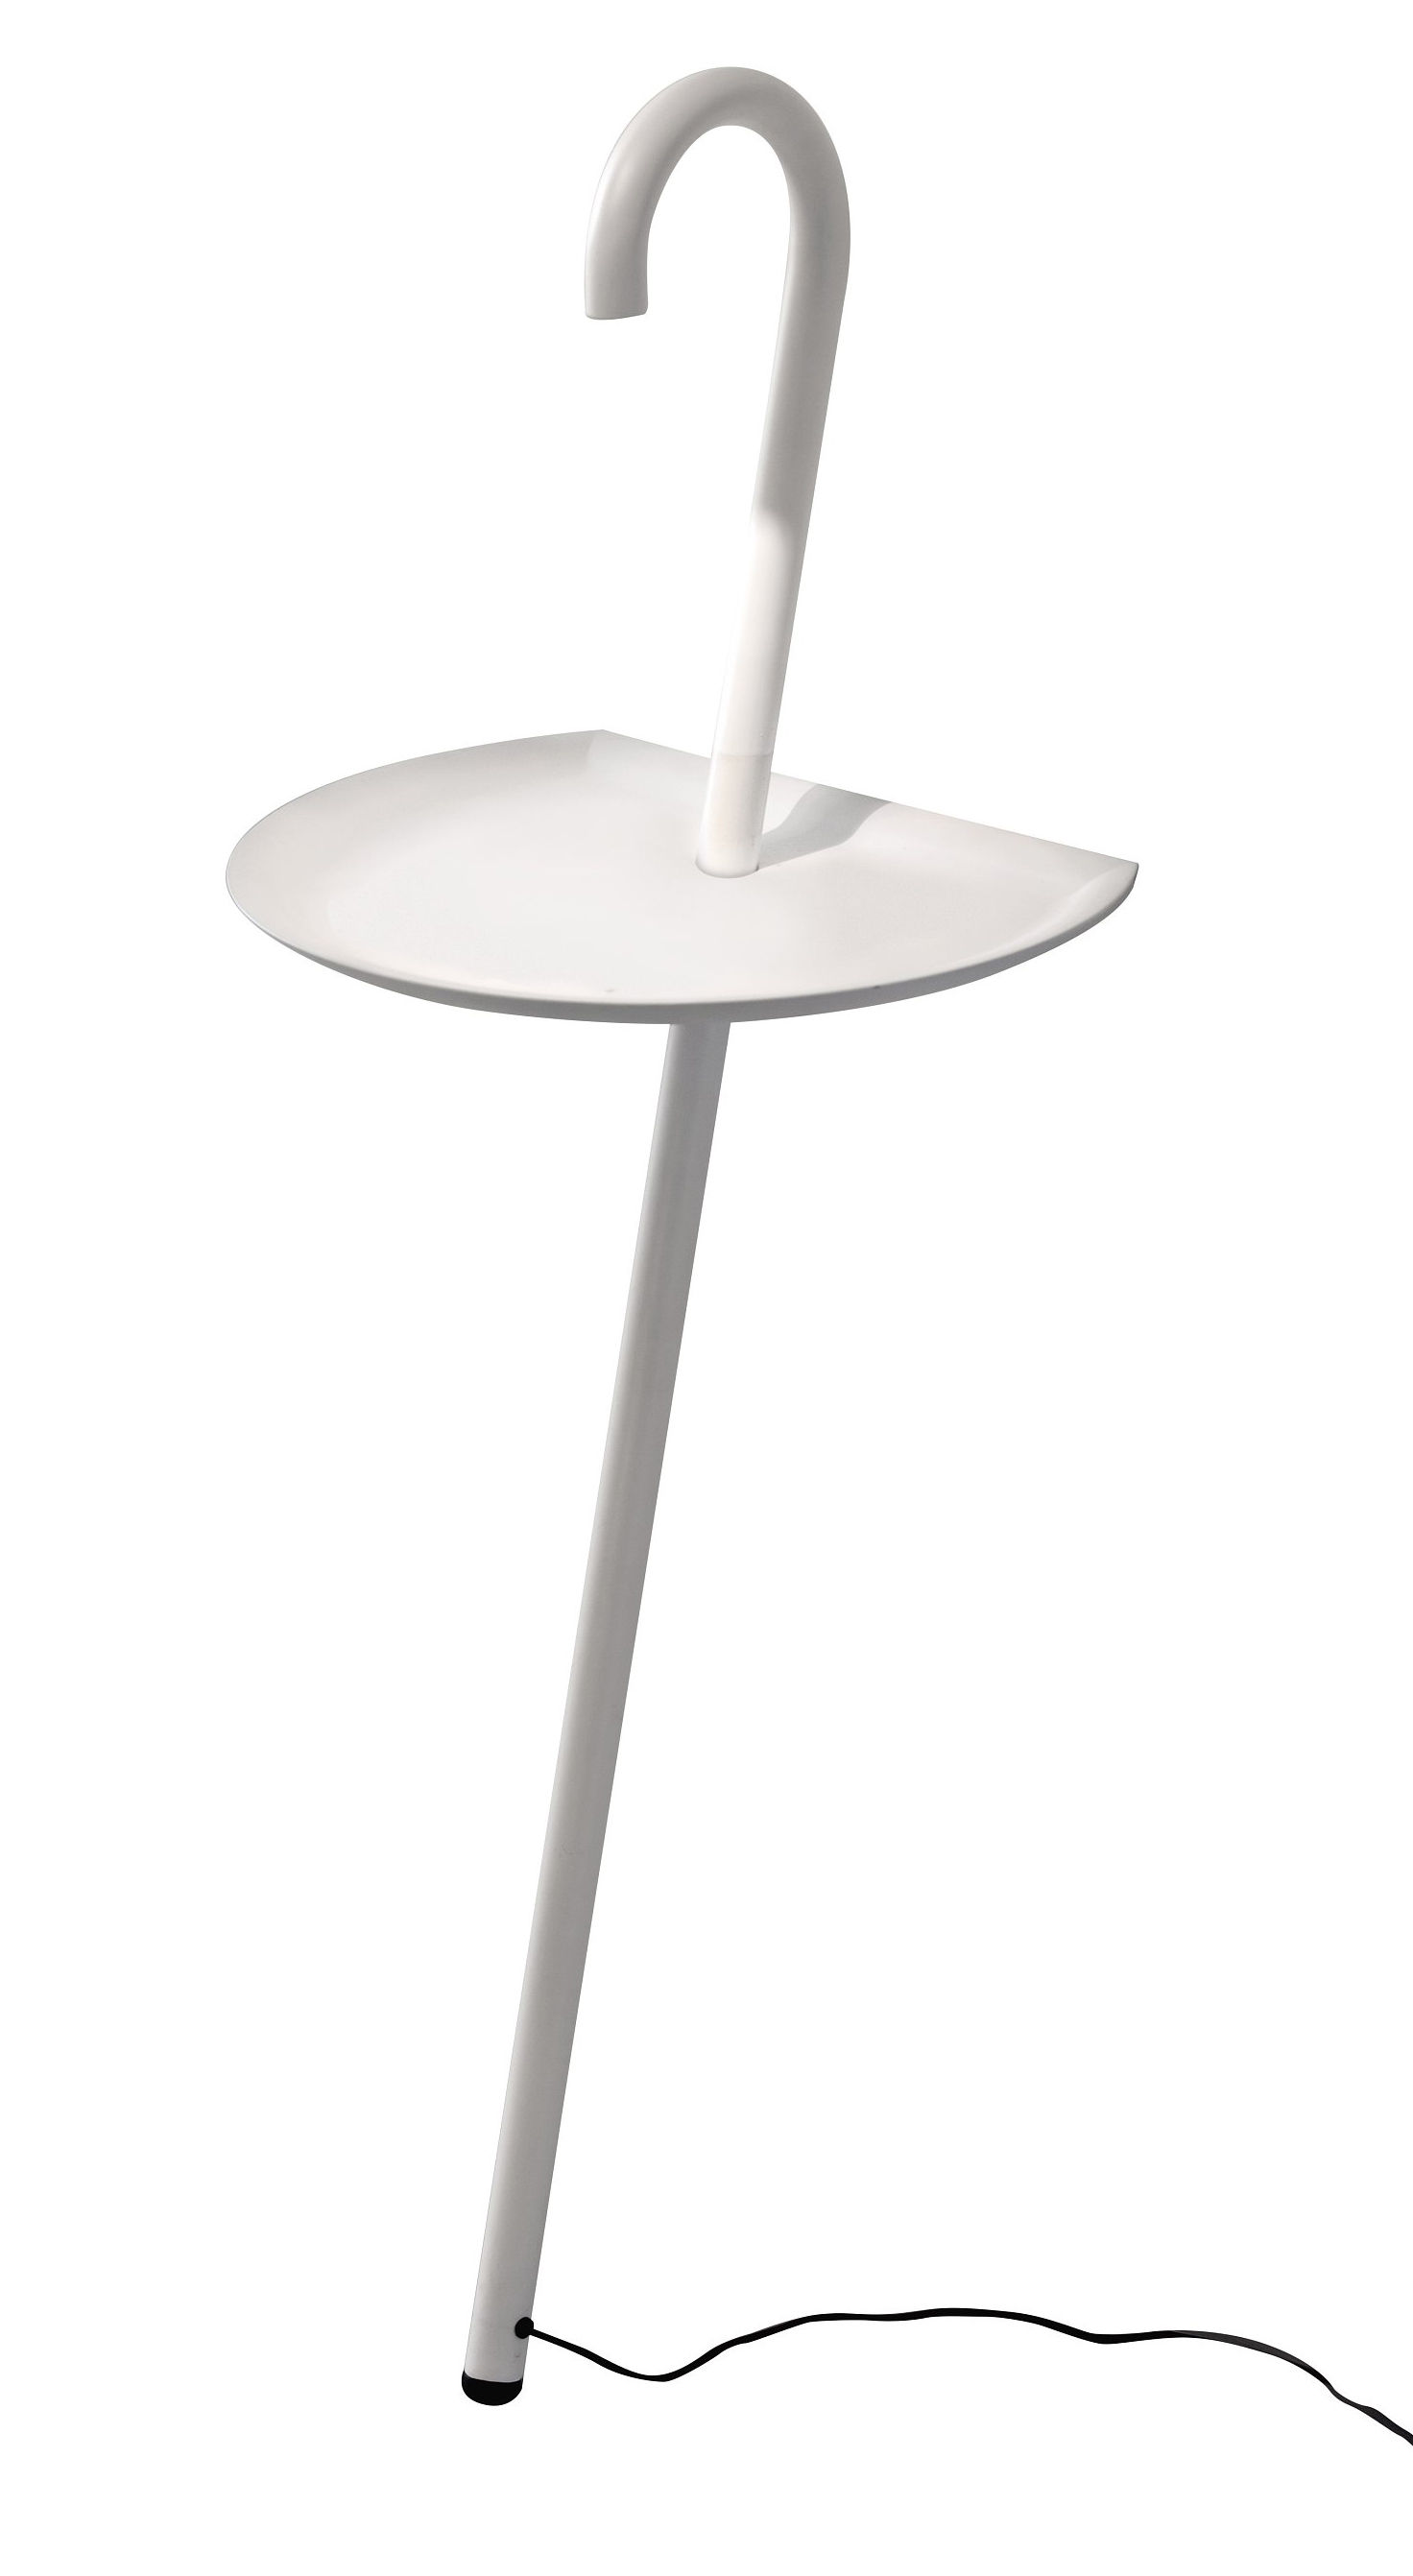 clochard led lampe gu ridon tisch wei by martinelli luce made in design. Black Bedroom Furniture Sets. Home Design Ideas